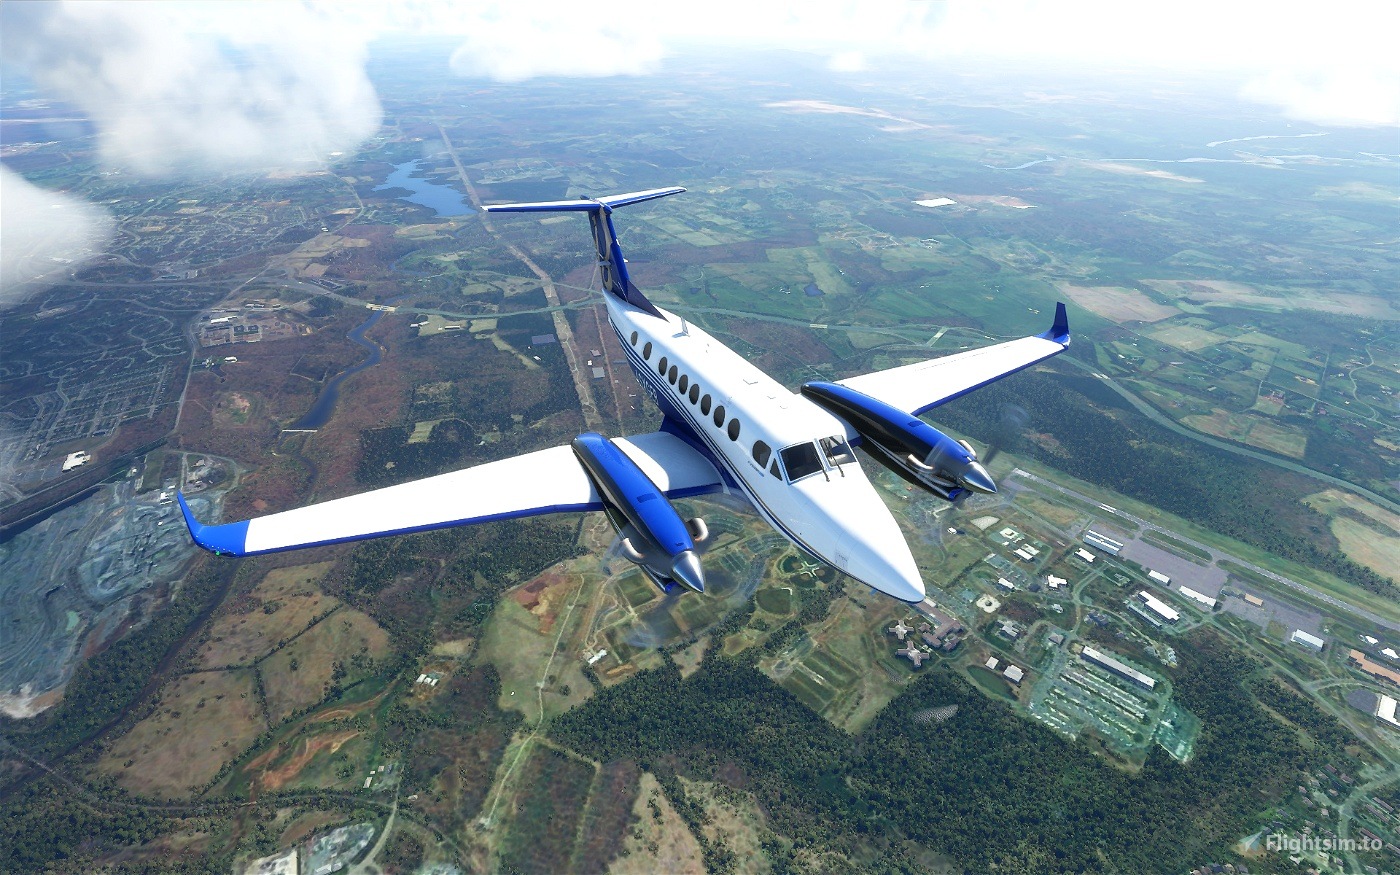 King Air 350i Metals and Alternate Color Liveries (8 total) Flight Simulator 2020